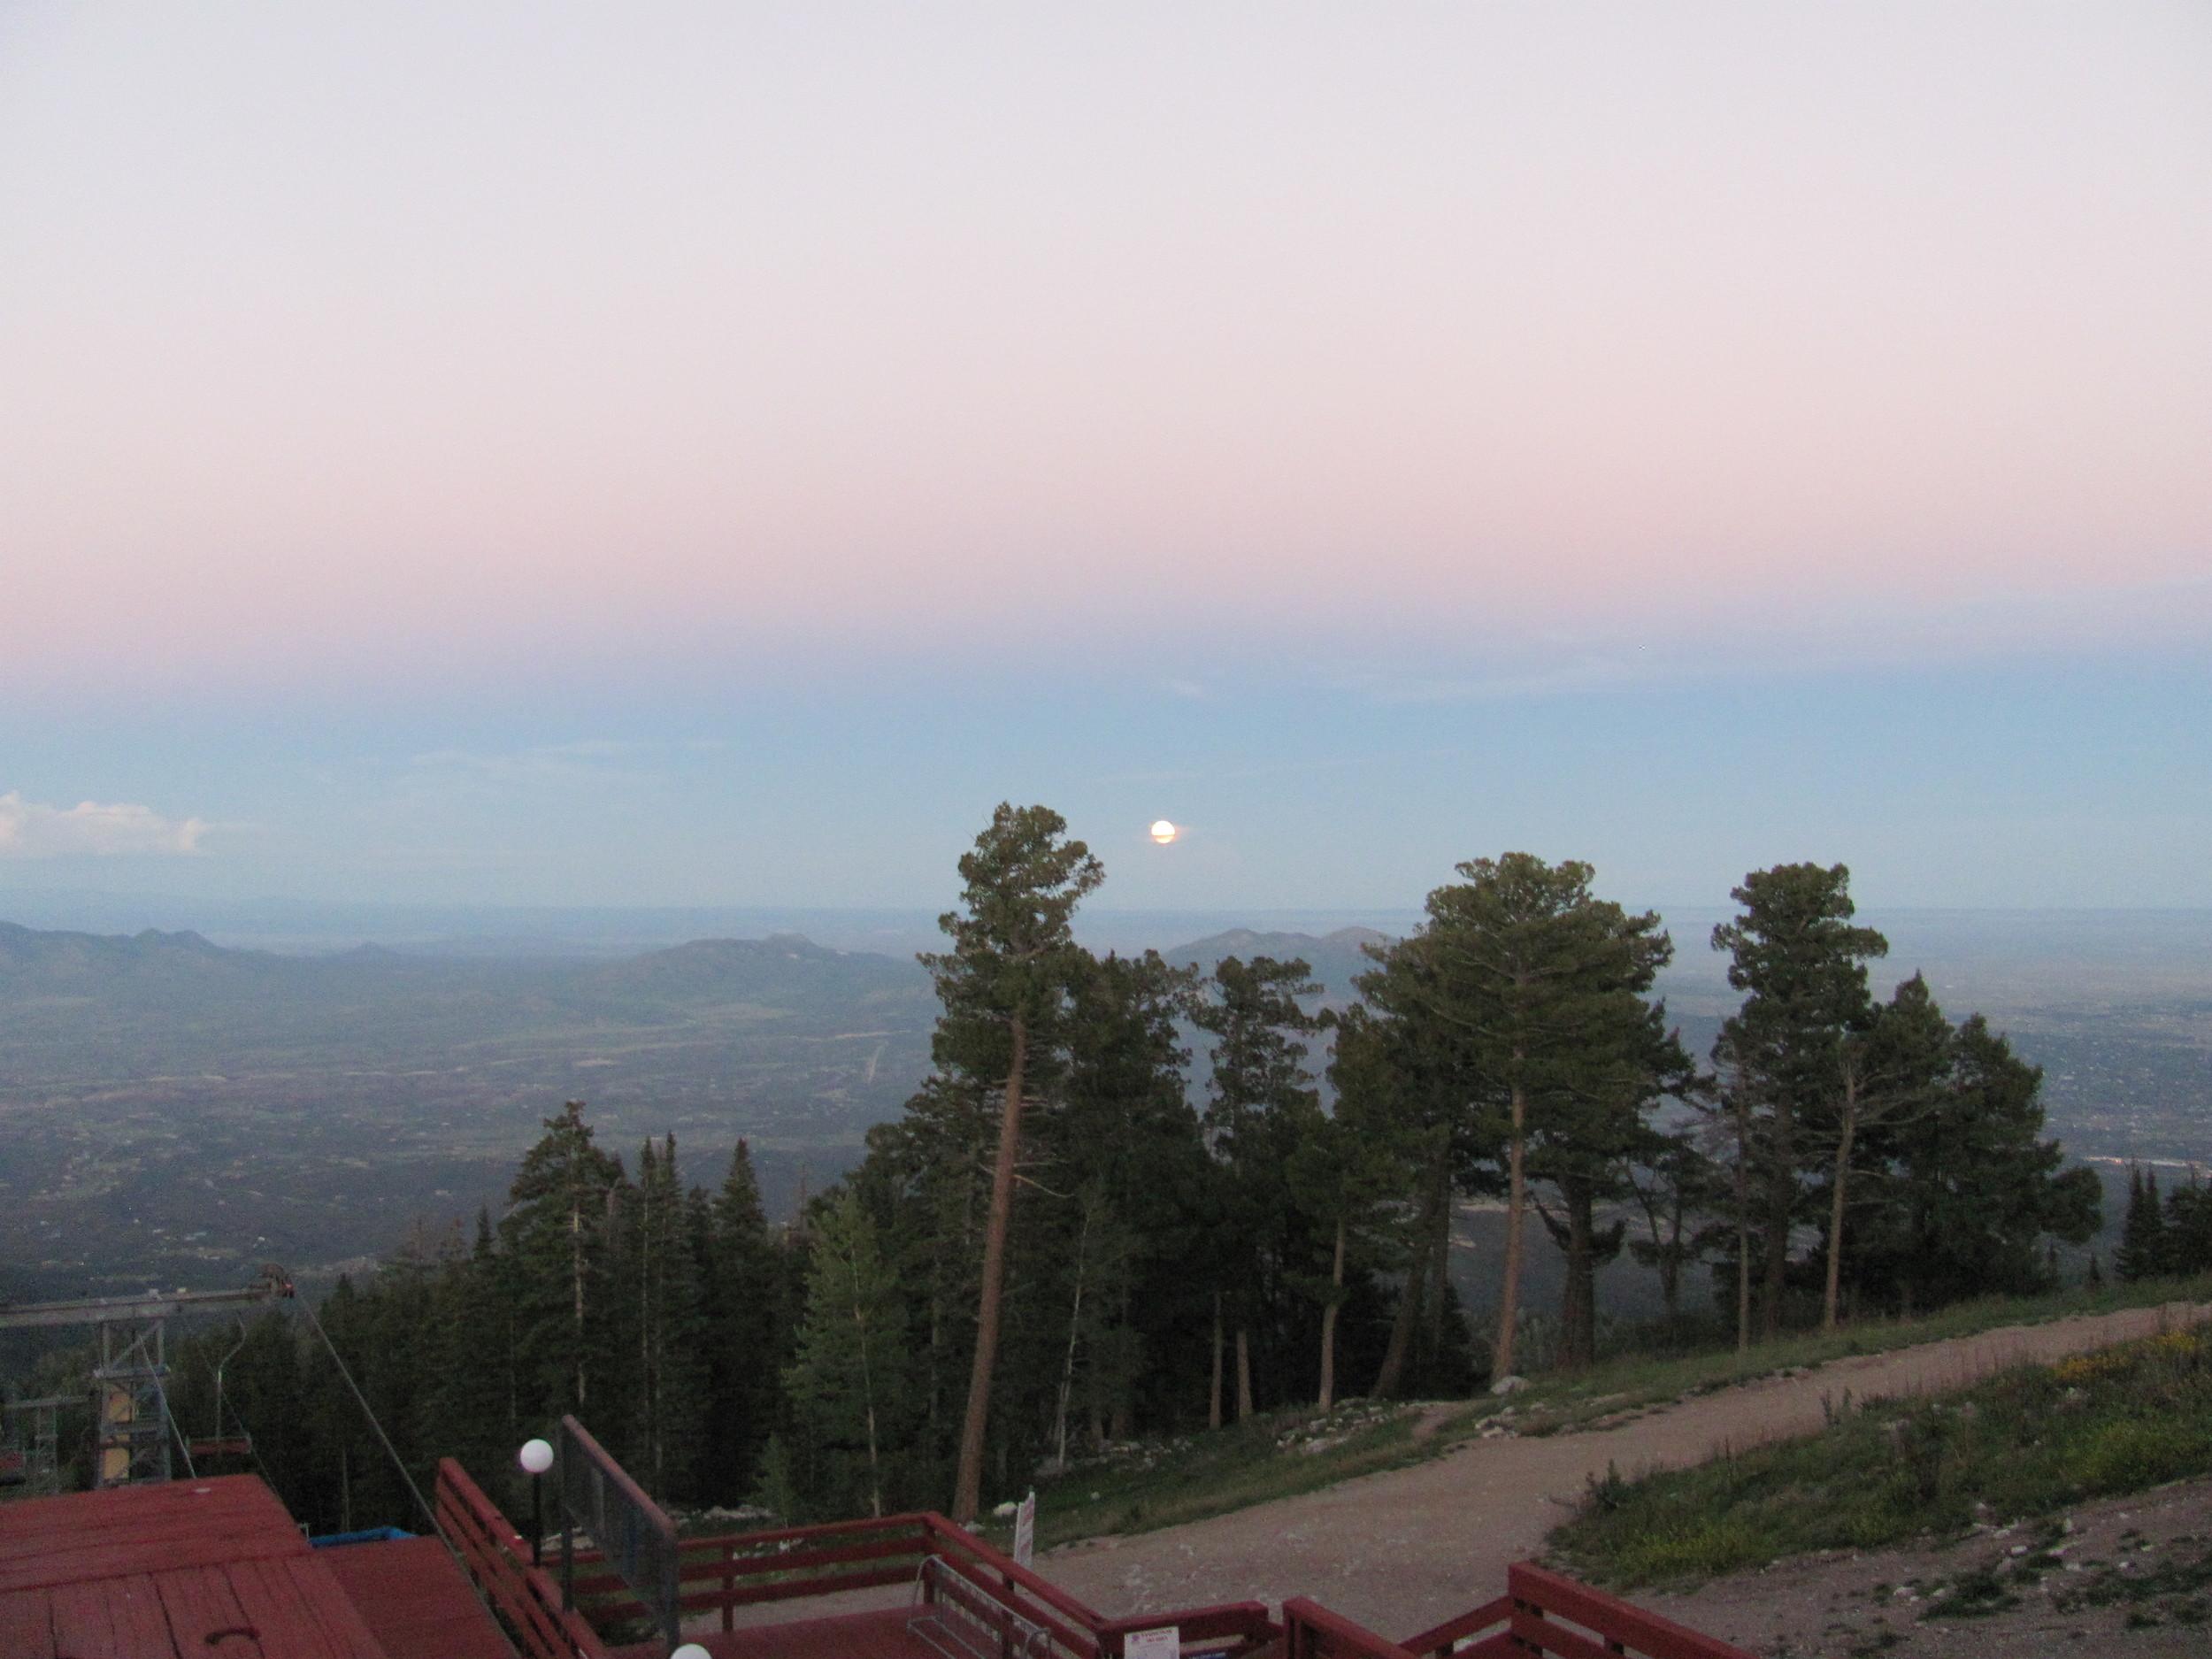 2013-09-19 High Finance restaurant at top of Sandia Peak tramway, Albuquerque NM (10).JPG